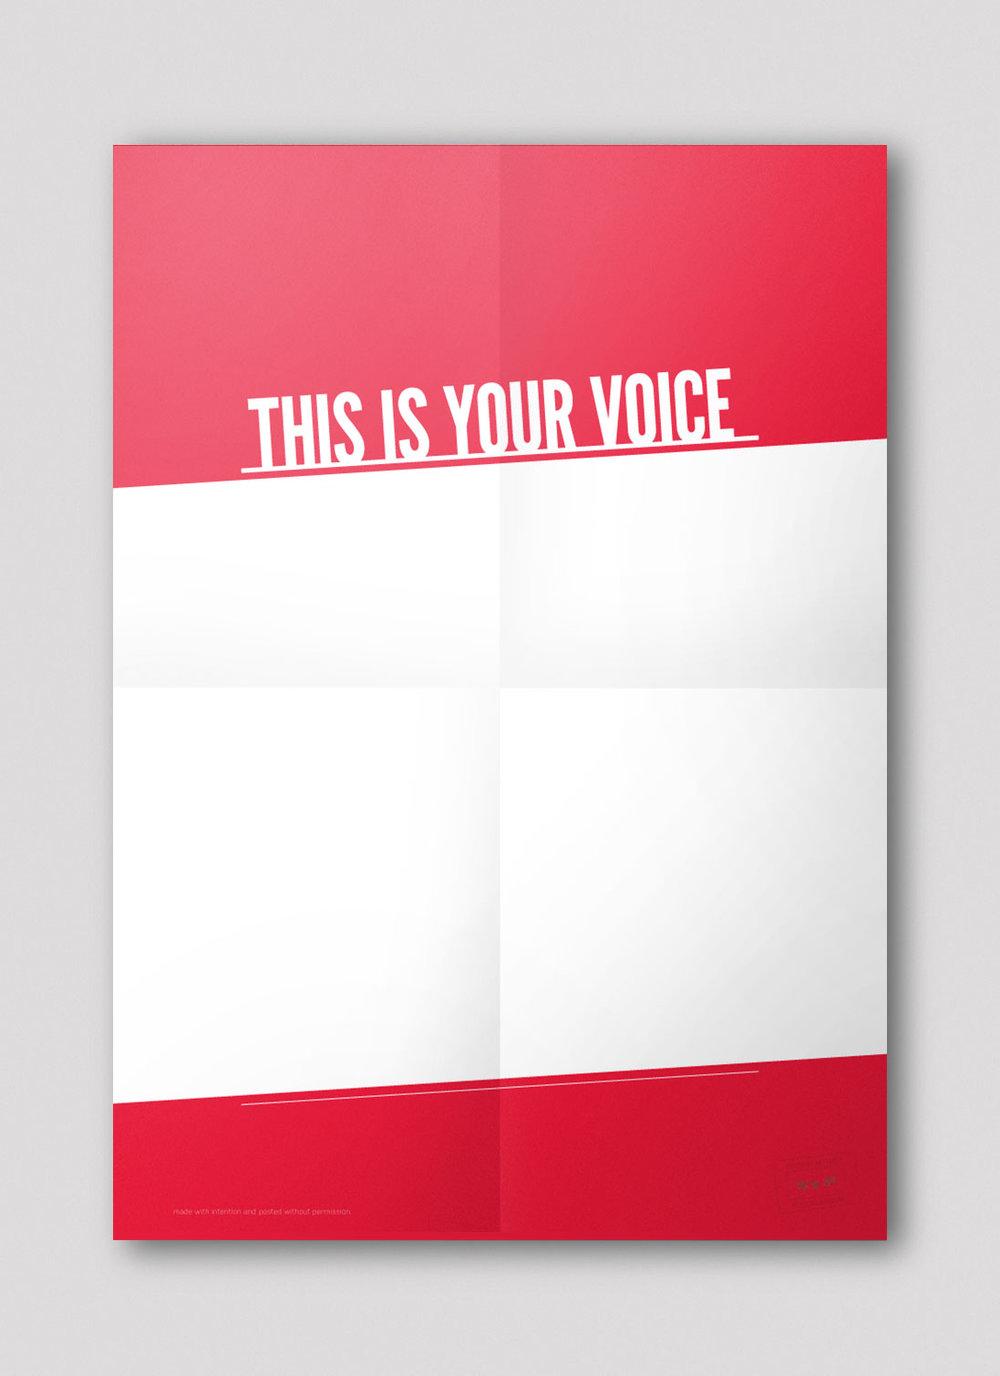 111106-yourvoice.jpg